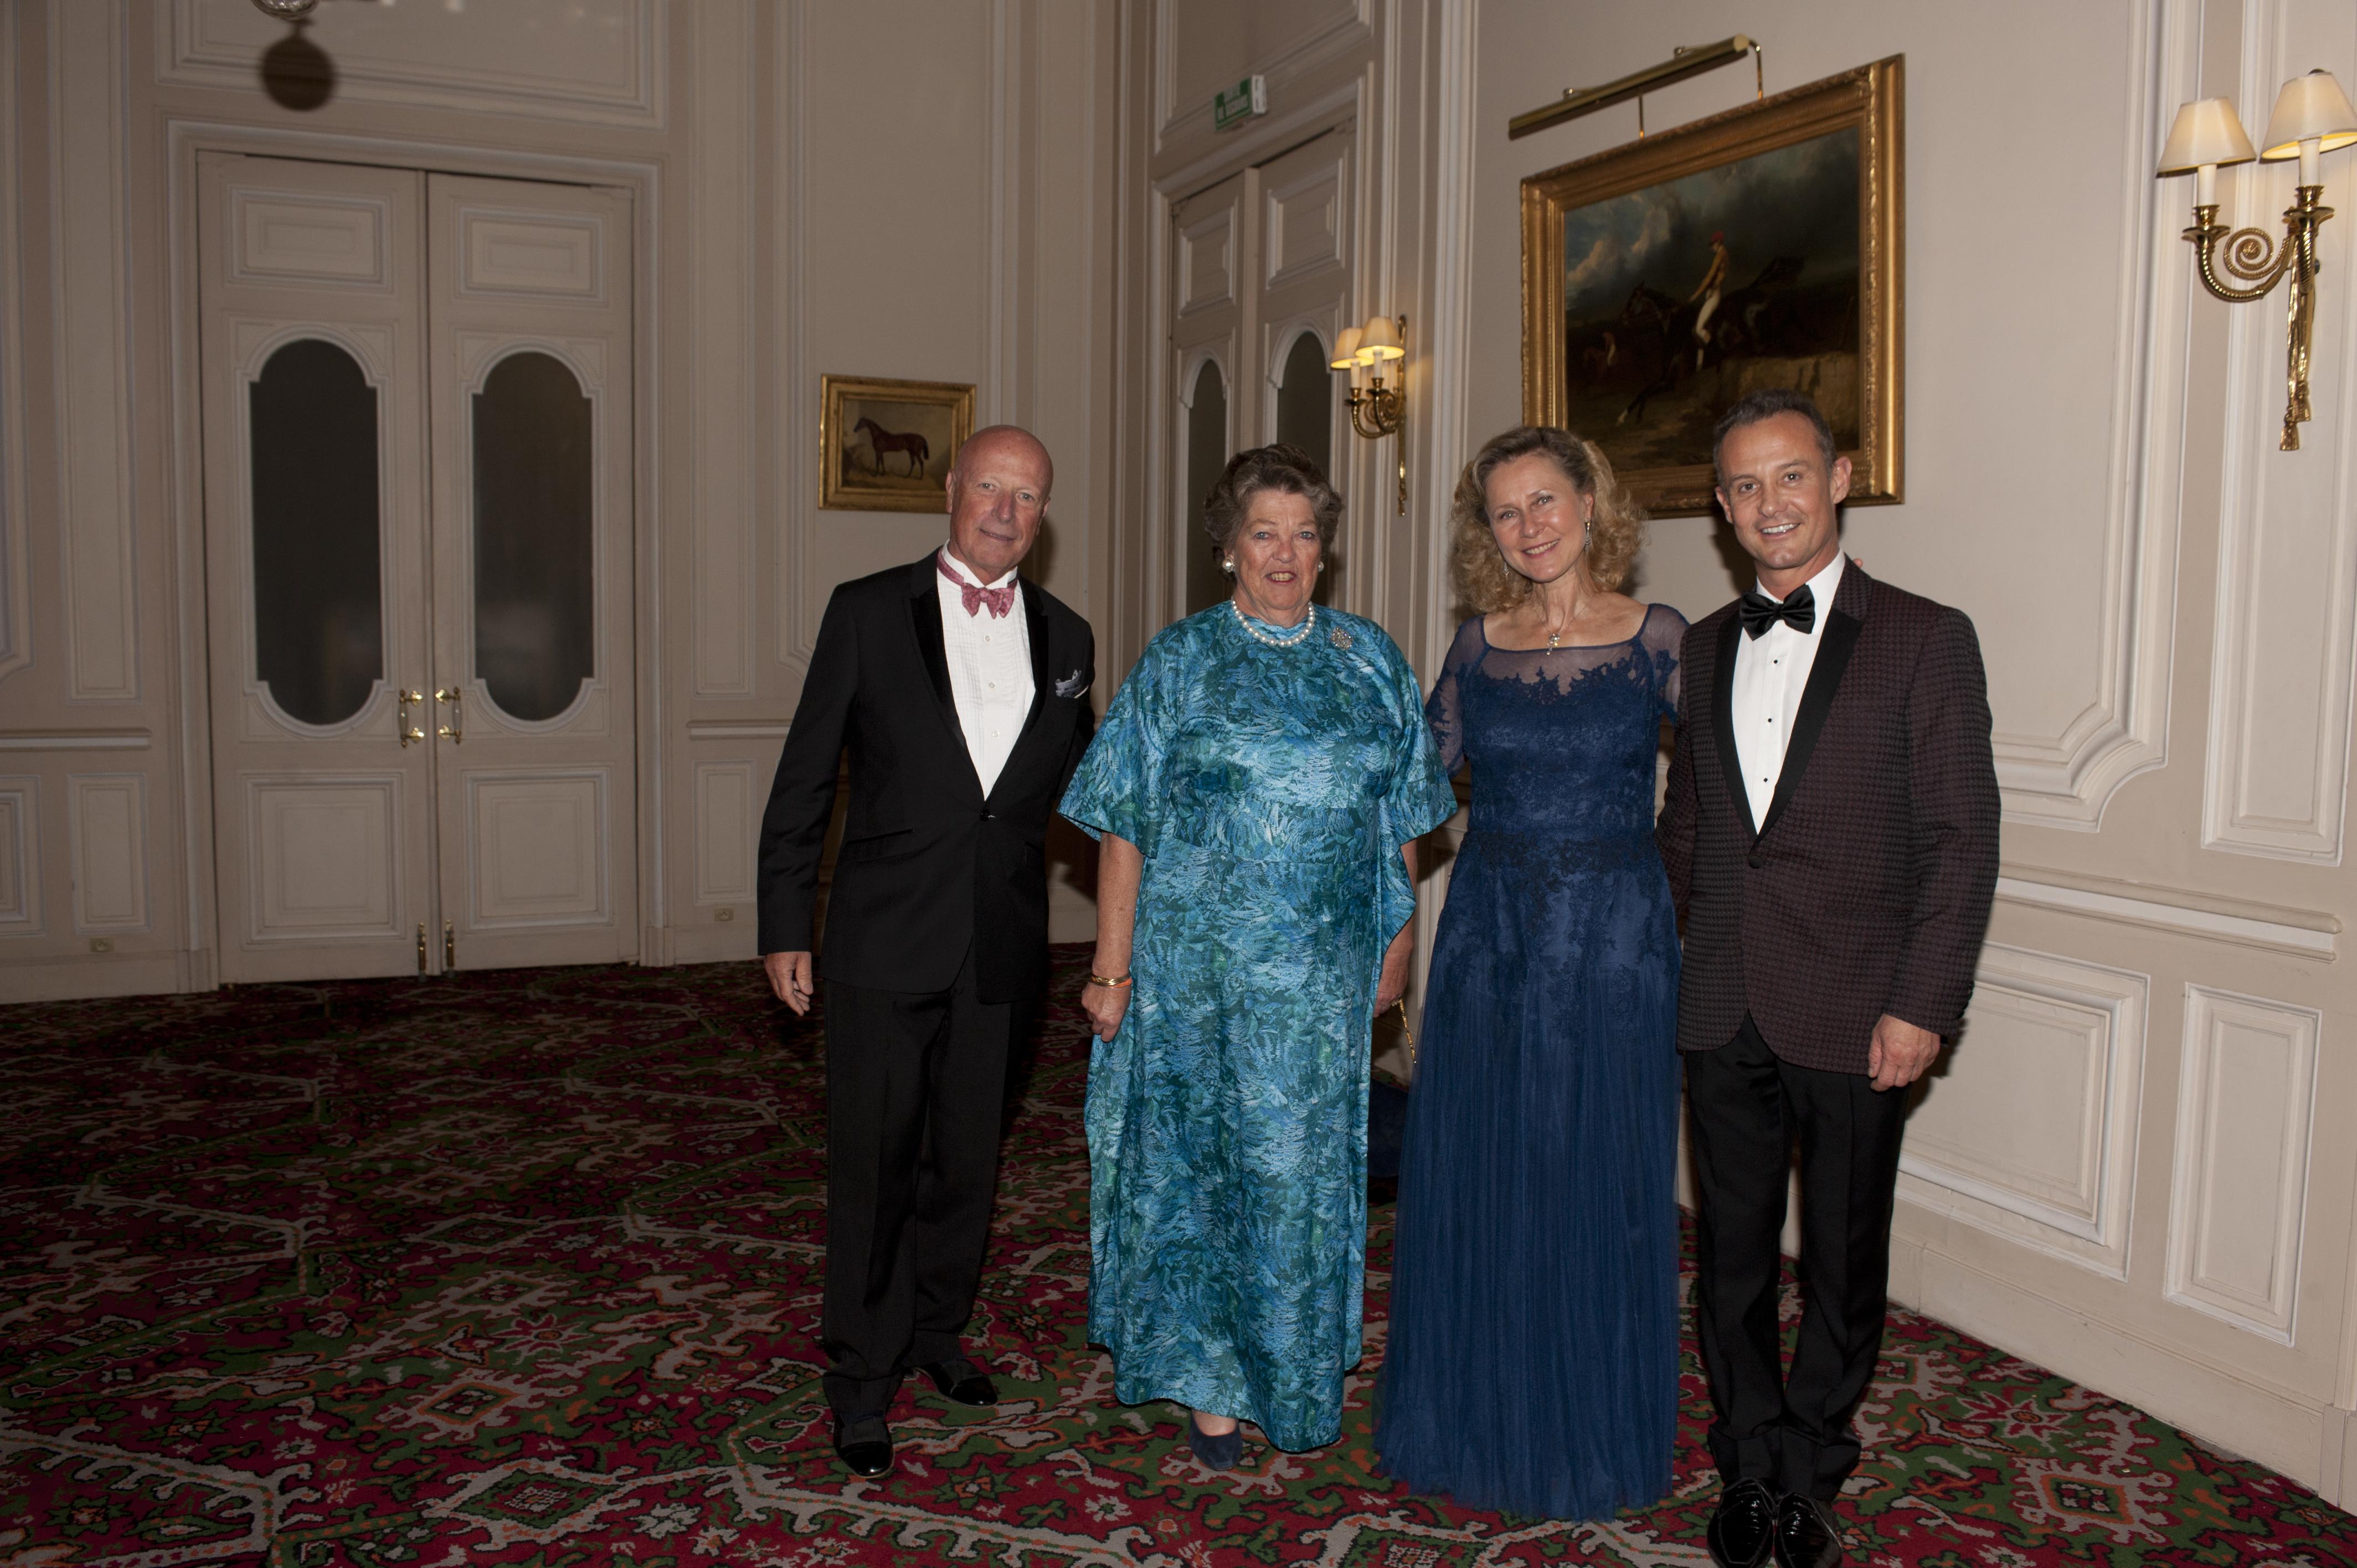 Baron François-Xavier de SAMBUCY de SORGUE - S.A.R la princesse Chantal de FRANCE - Armelle CEGLEC - Francis BAILLET